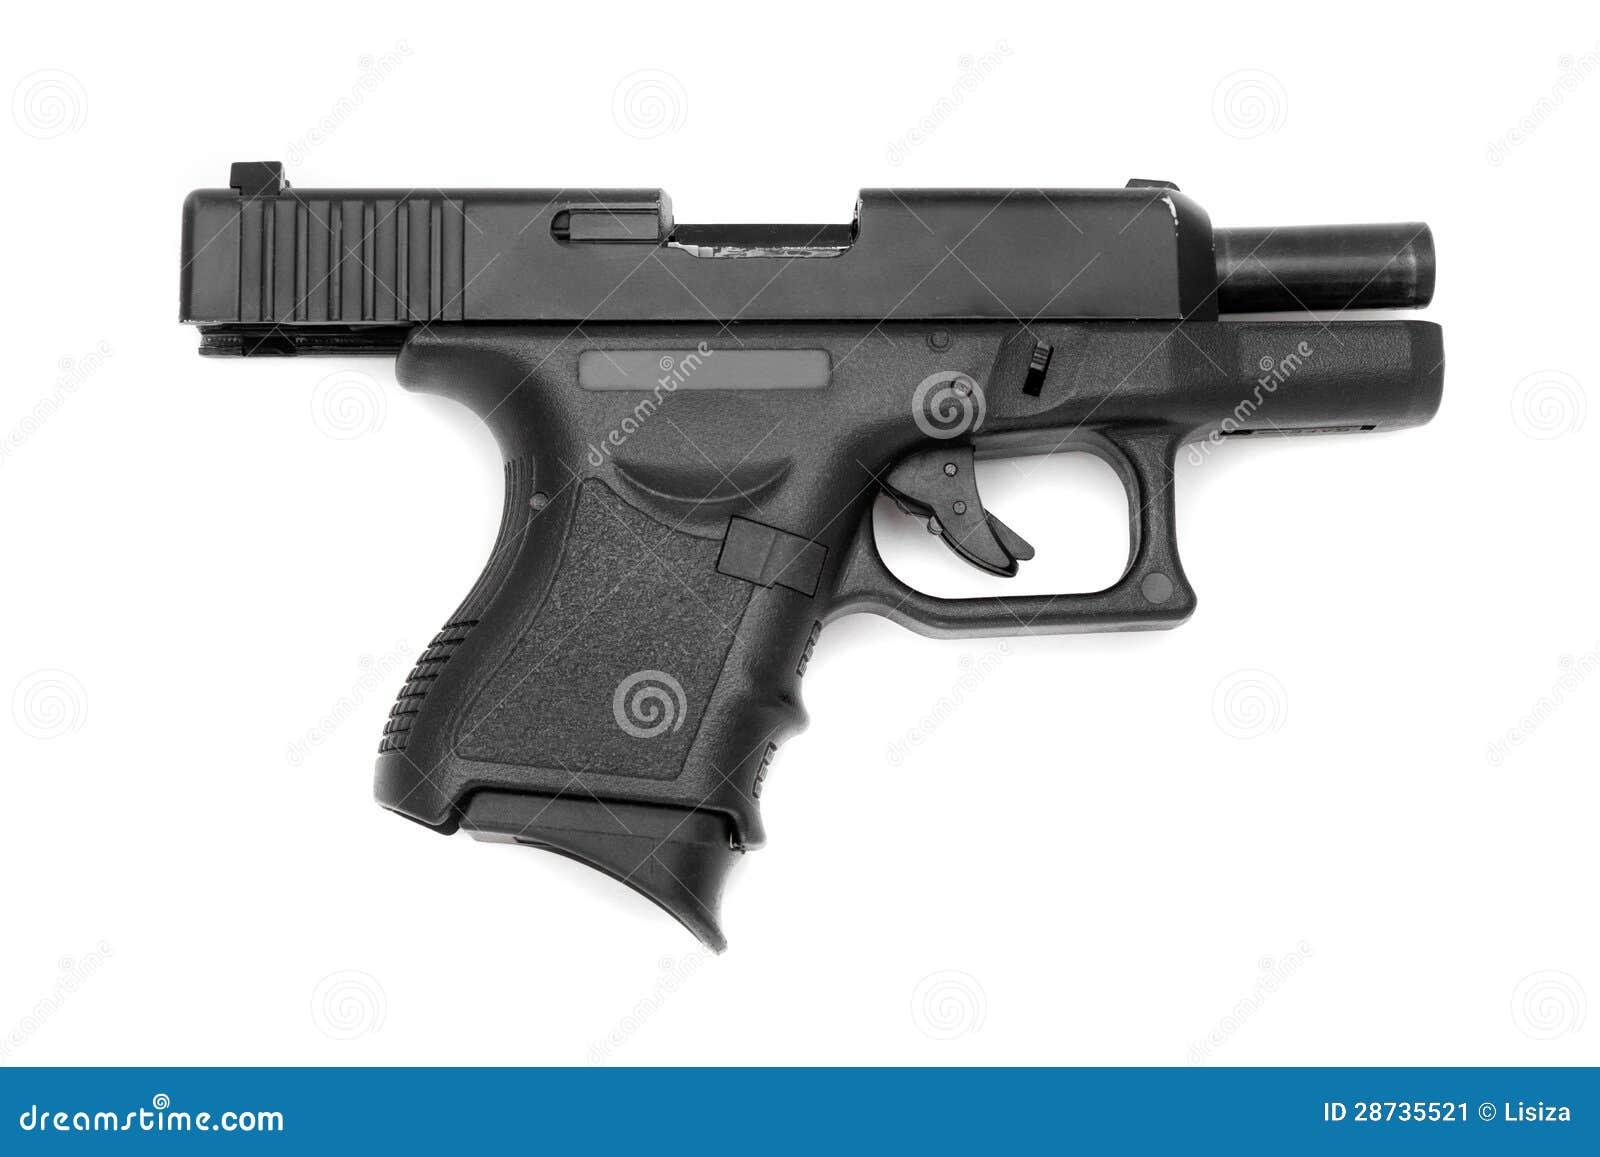 gun white background - photo #21